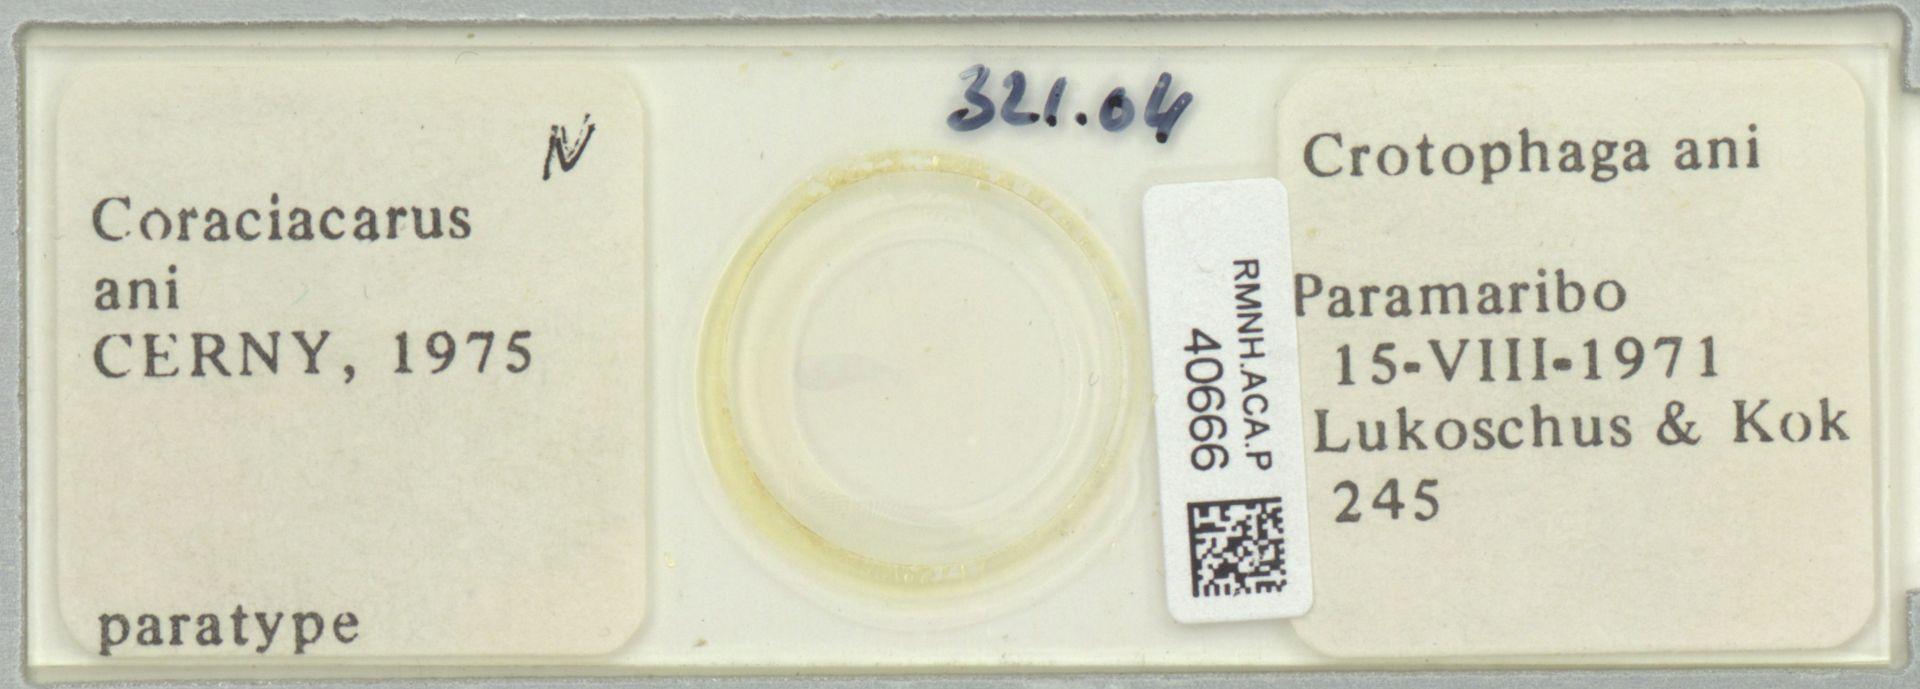 RMNH.ACA.P.40666 | Coraciacatus ani Cerny, 1975